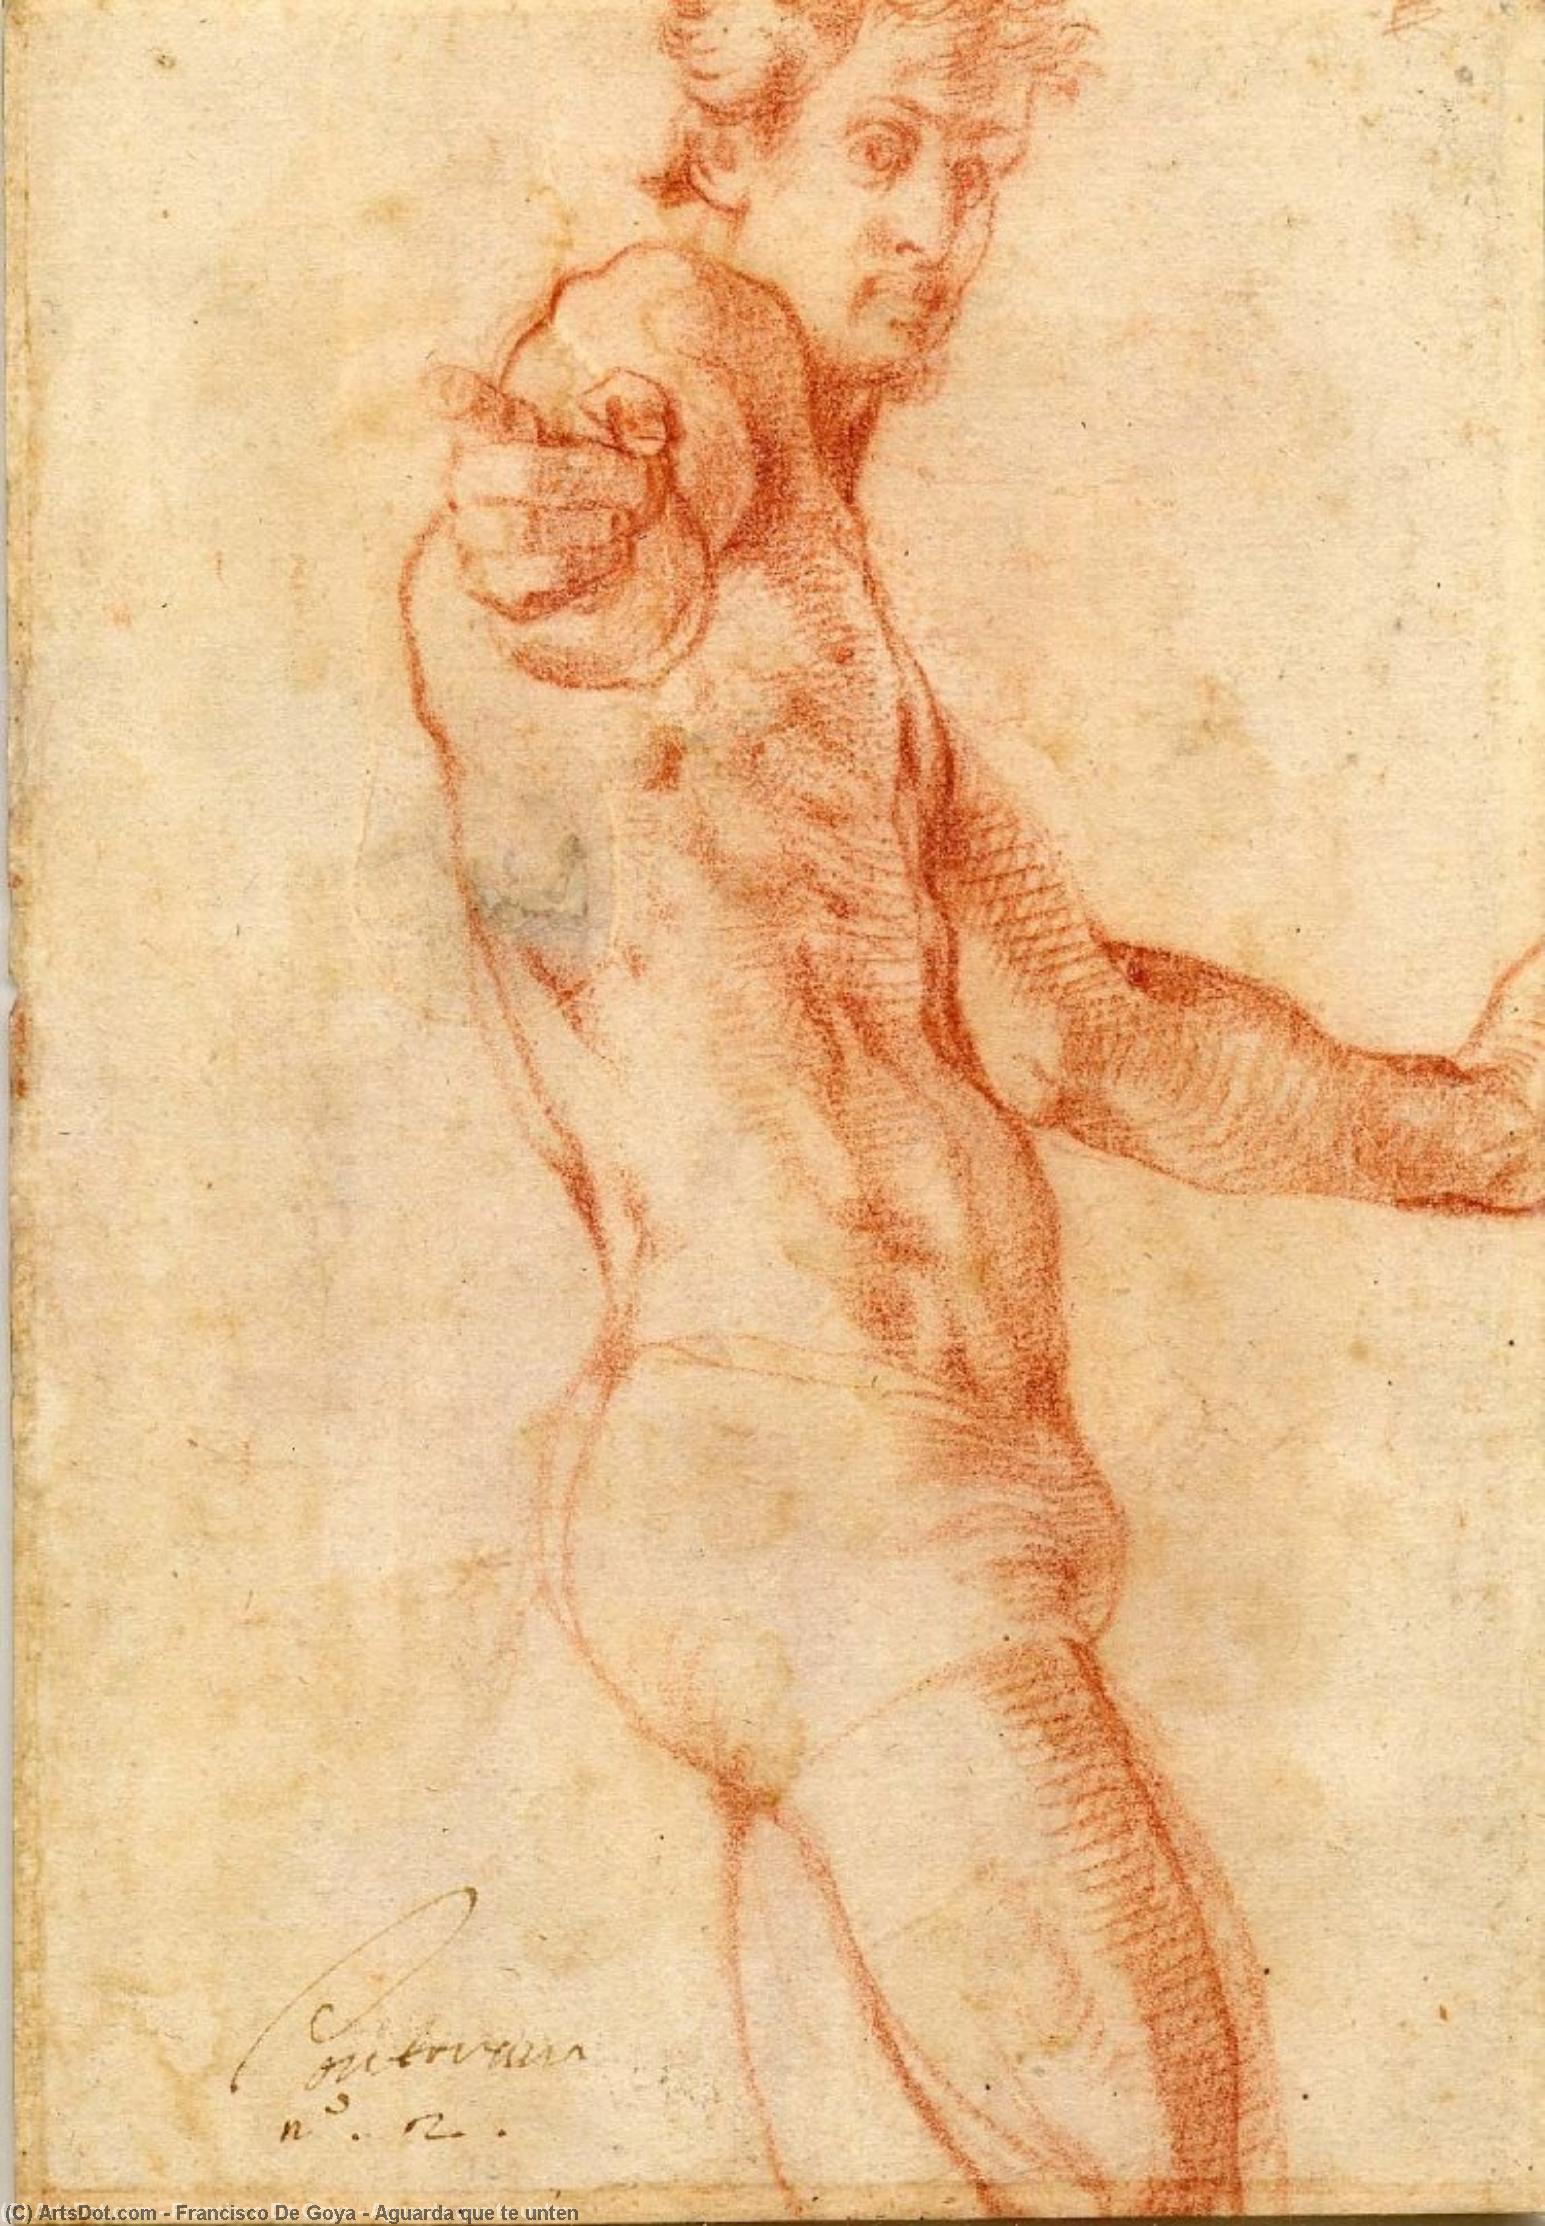 Wikioo.org - The Encyclopedia of Fine Arts - Painting, Artwork by Francisco De Goya - Aguarda que te unten